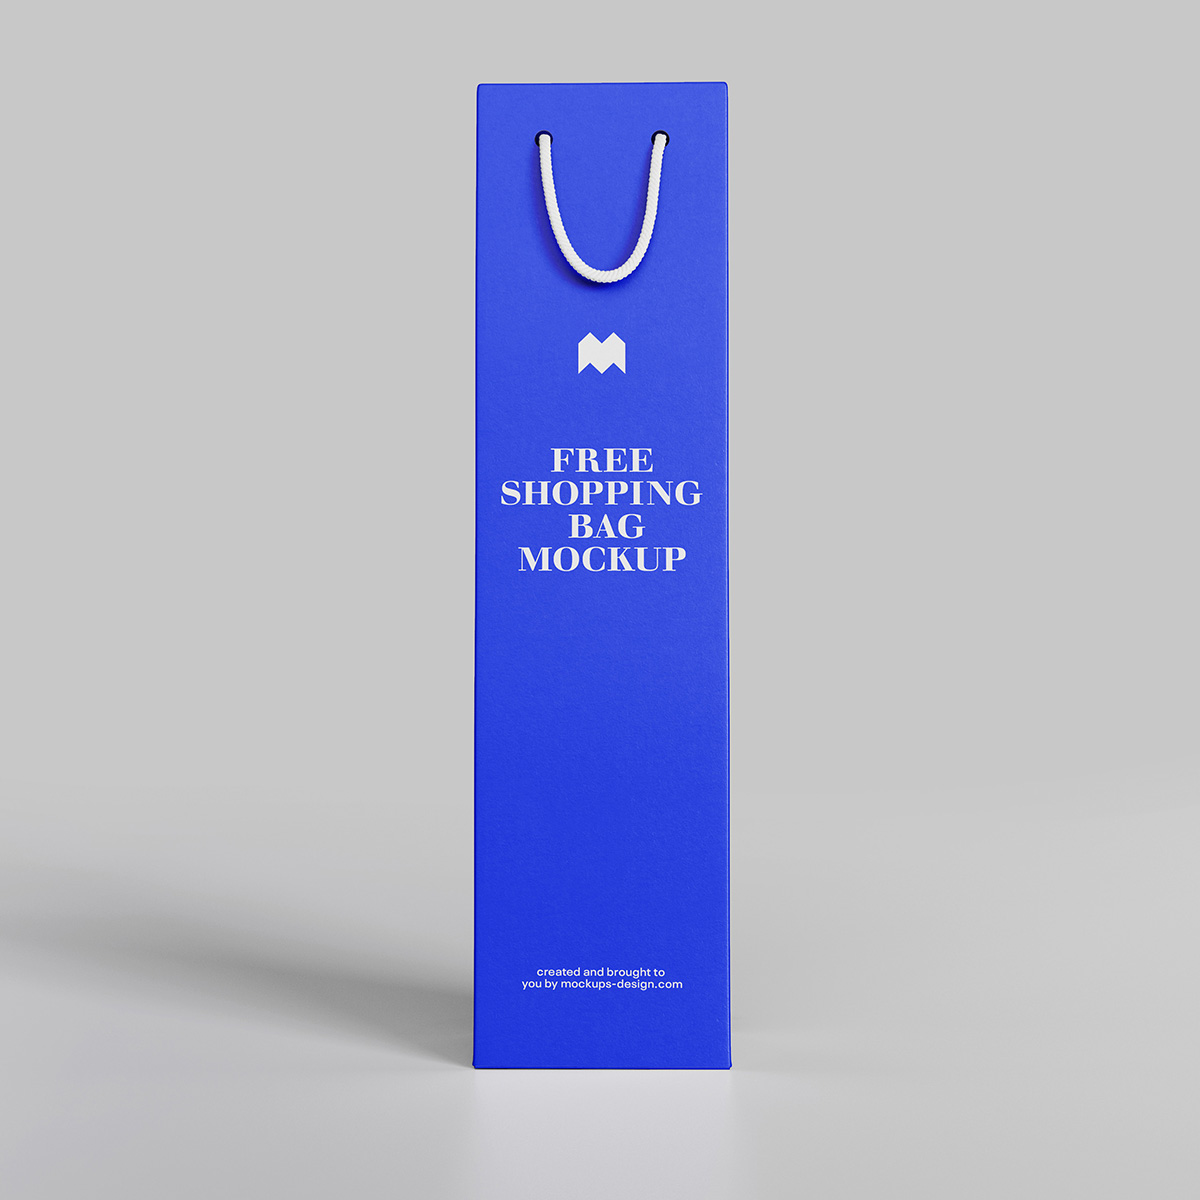 Free wine bag mockup